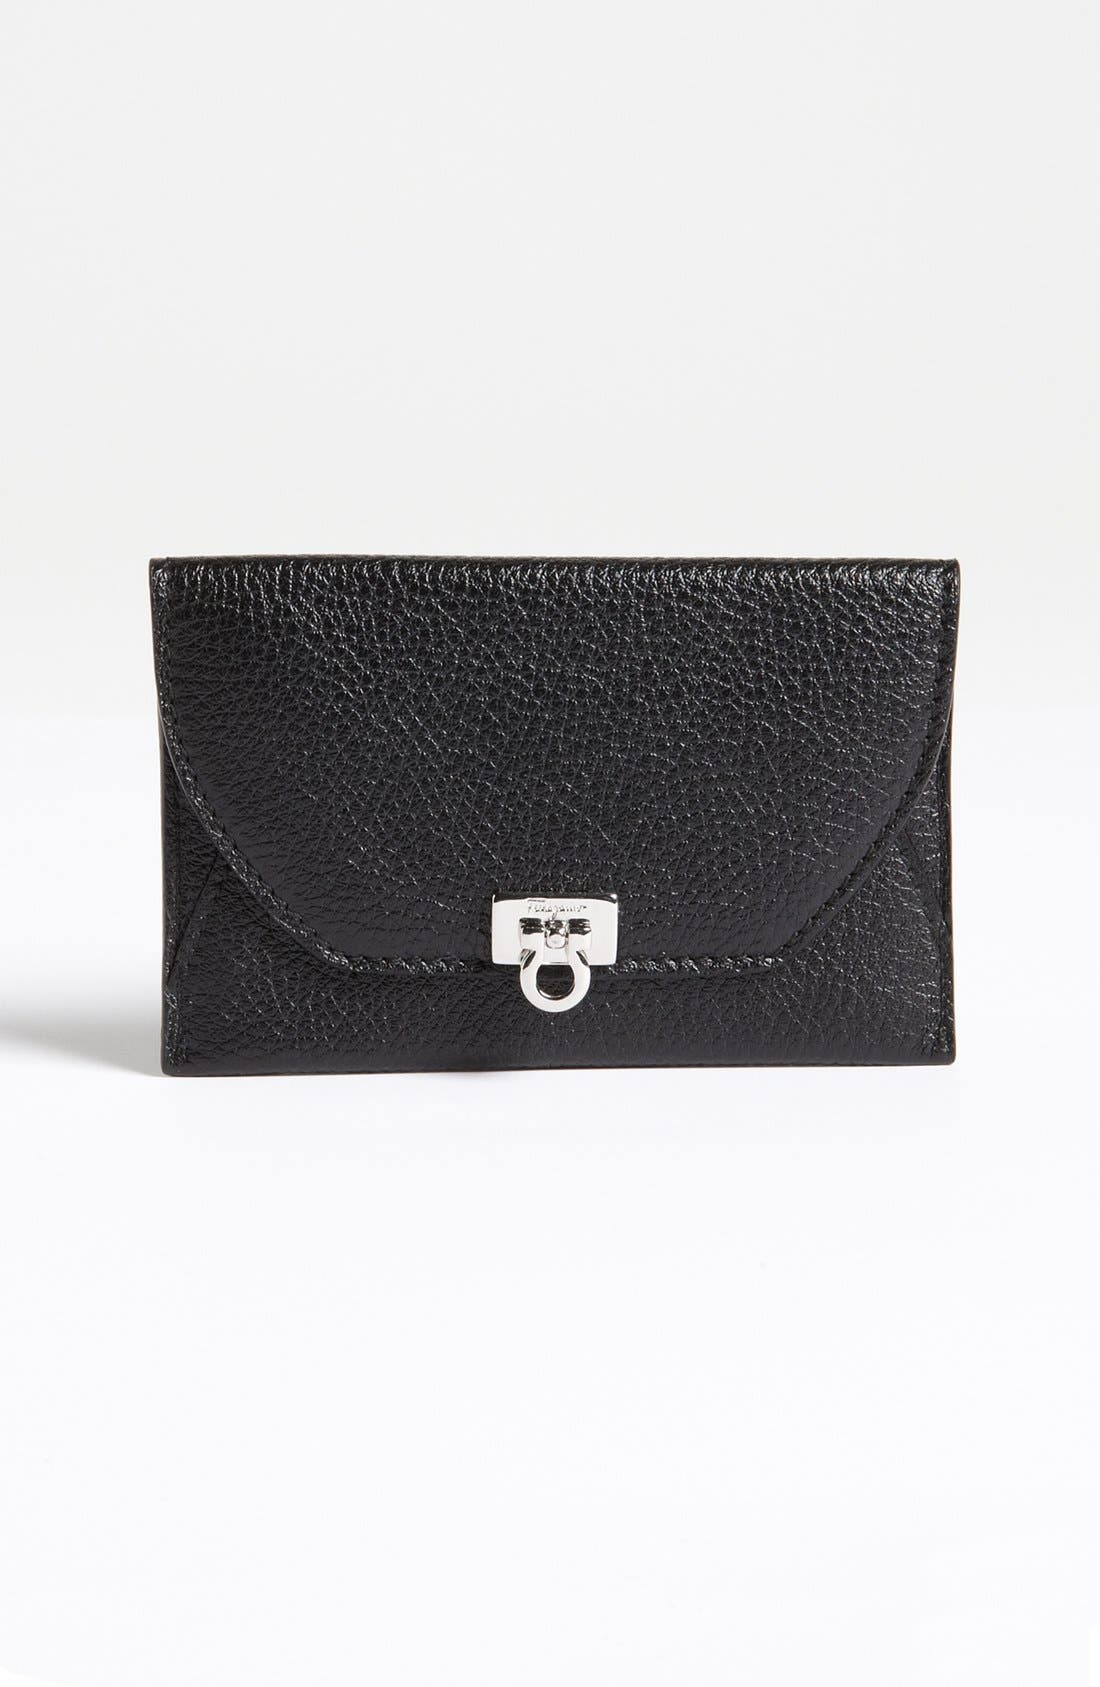 Main Image - Salvatore Ferragamo 'Safari' Leather Card Case